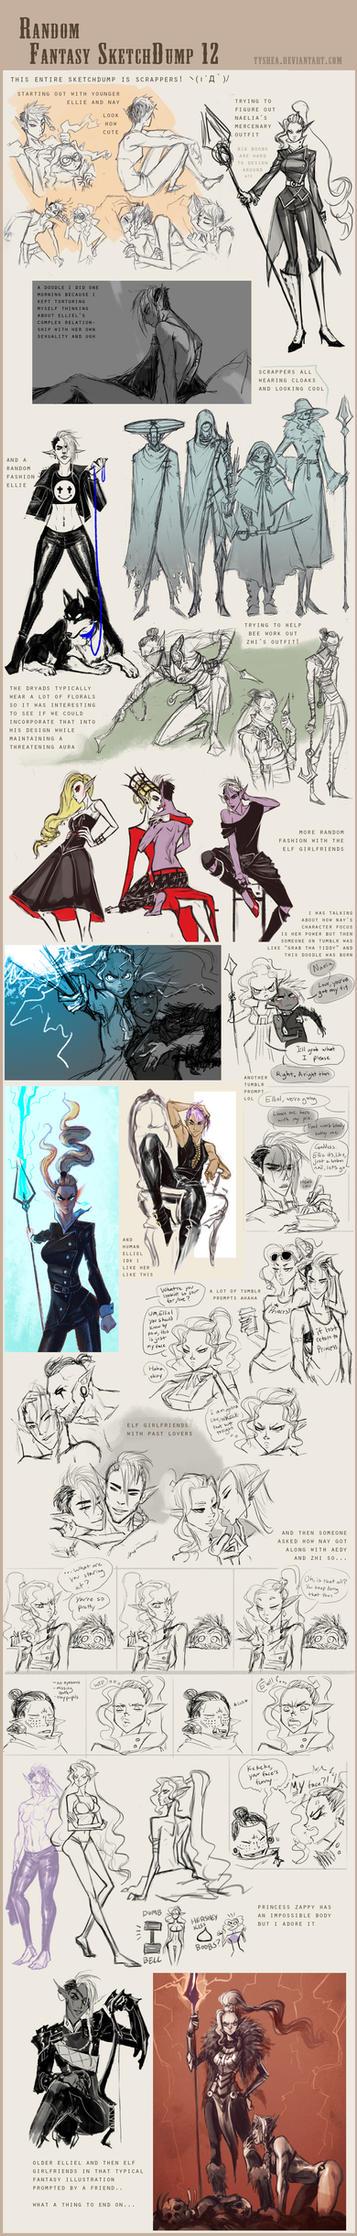 Fantasy Sketchdump 12 by Dyemelikeasunset